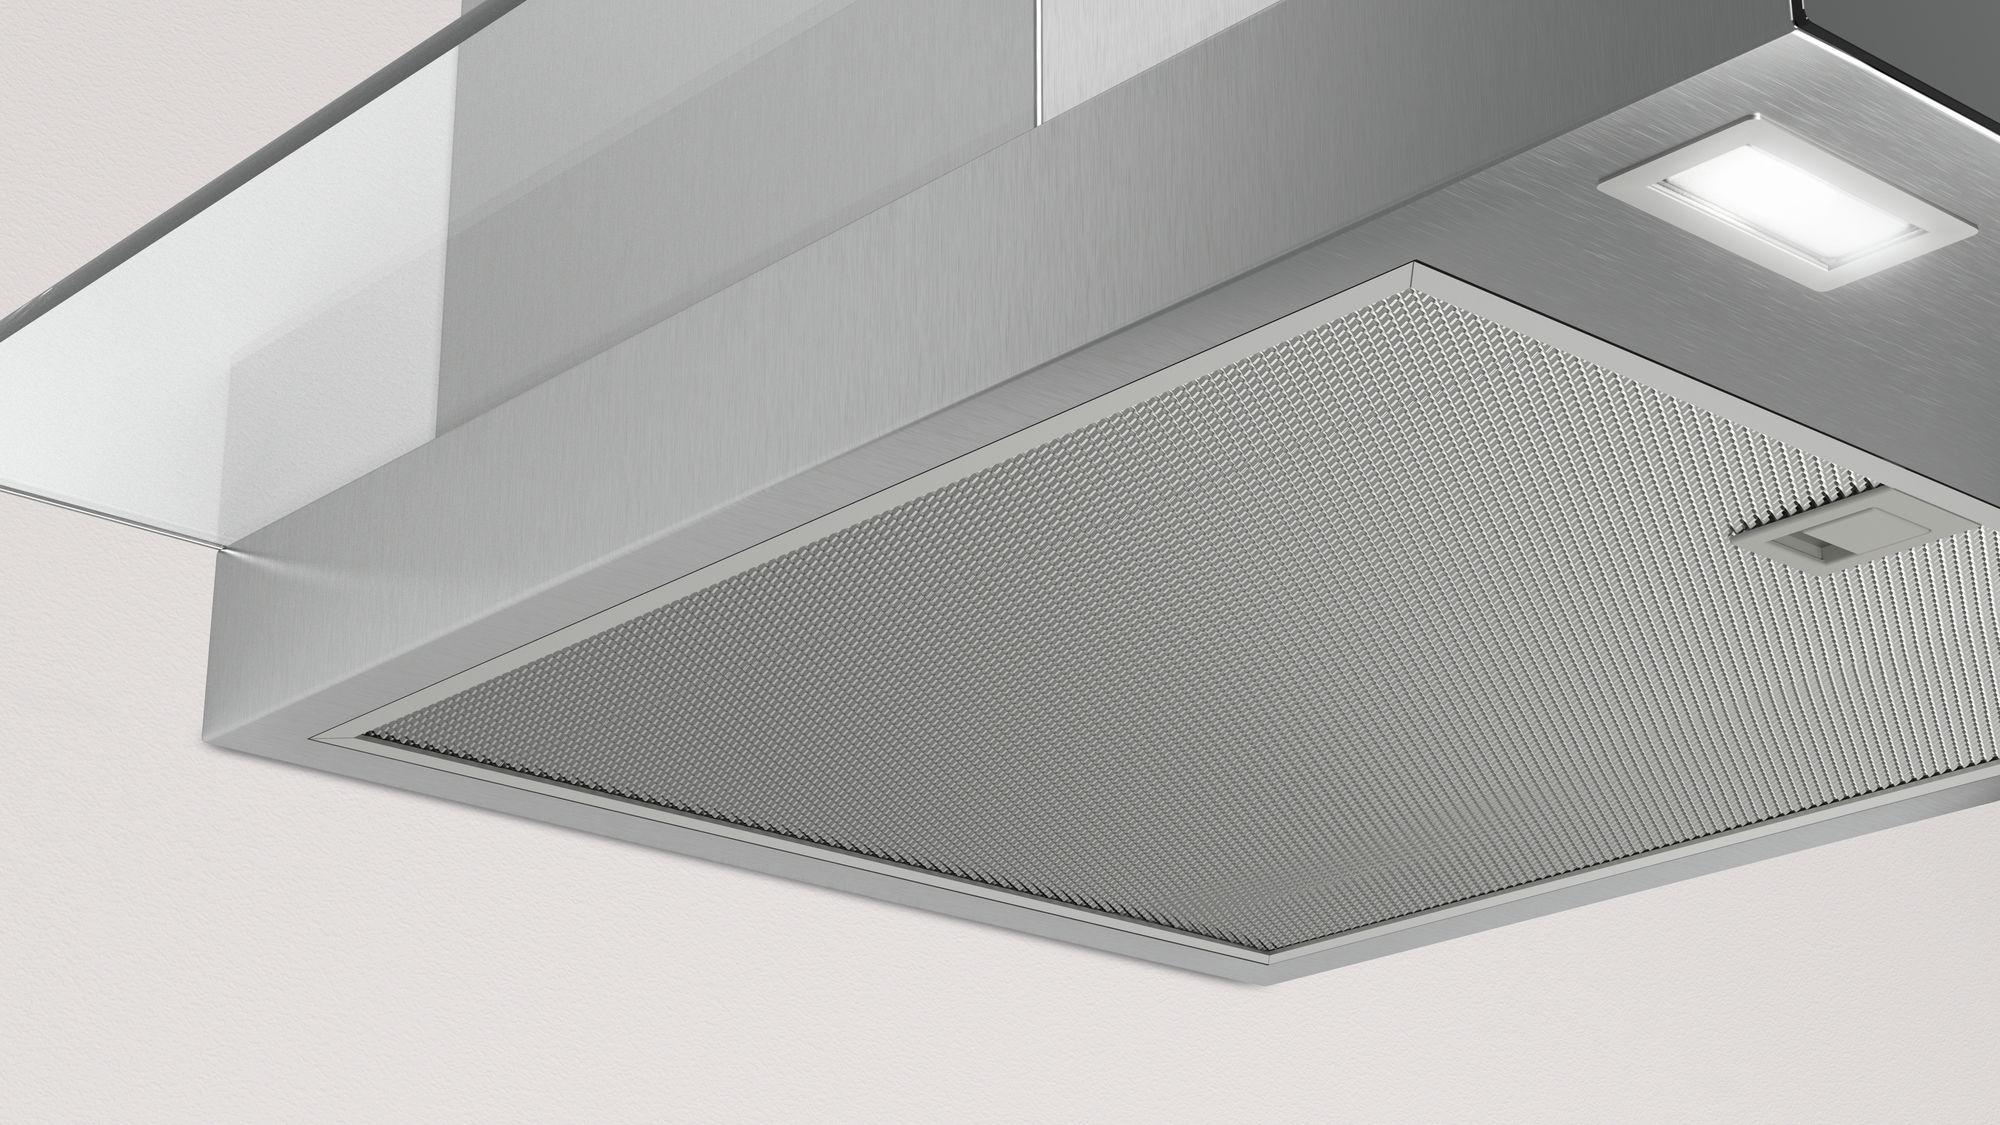 Constructa dunstabzugshauben filter ᑕ❶ᑐ aktivkohlefilter